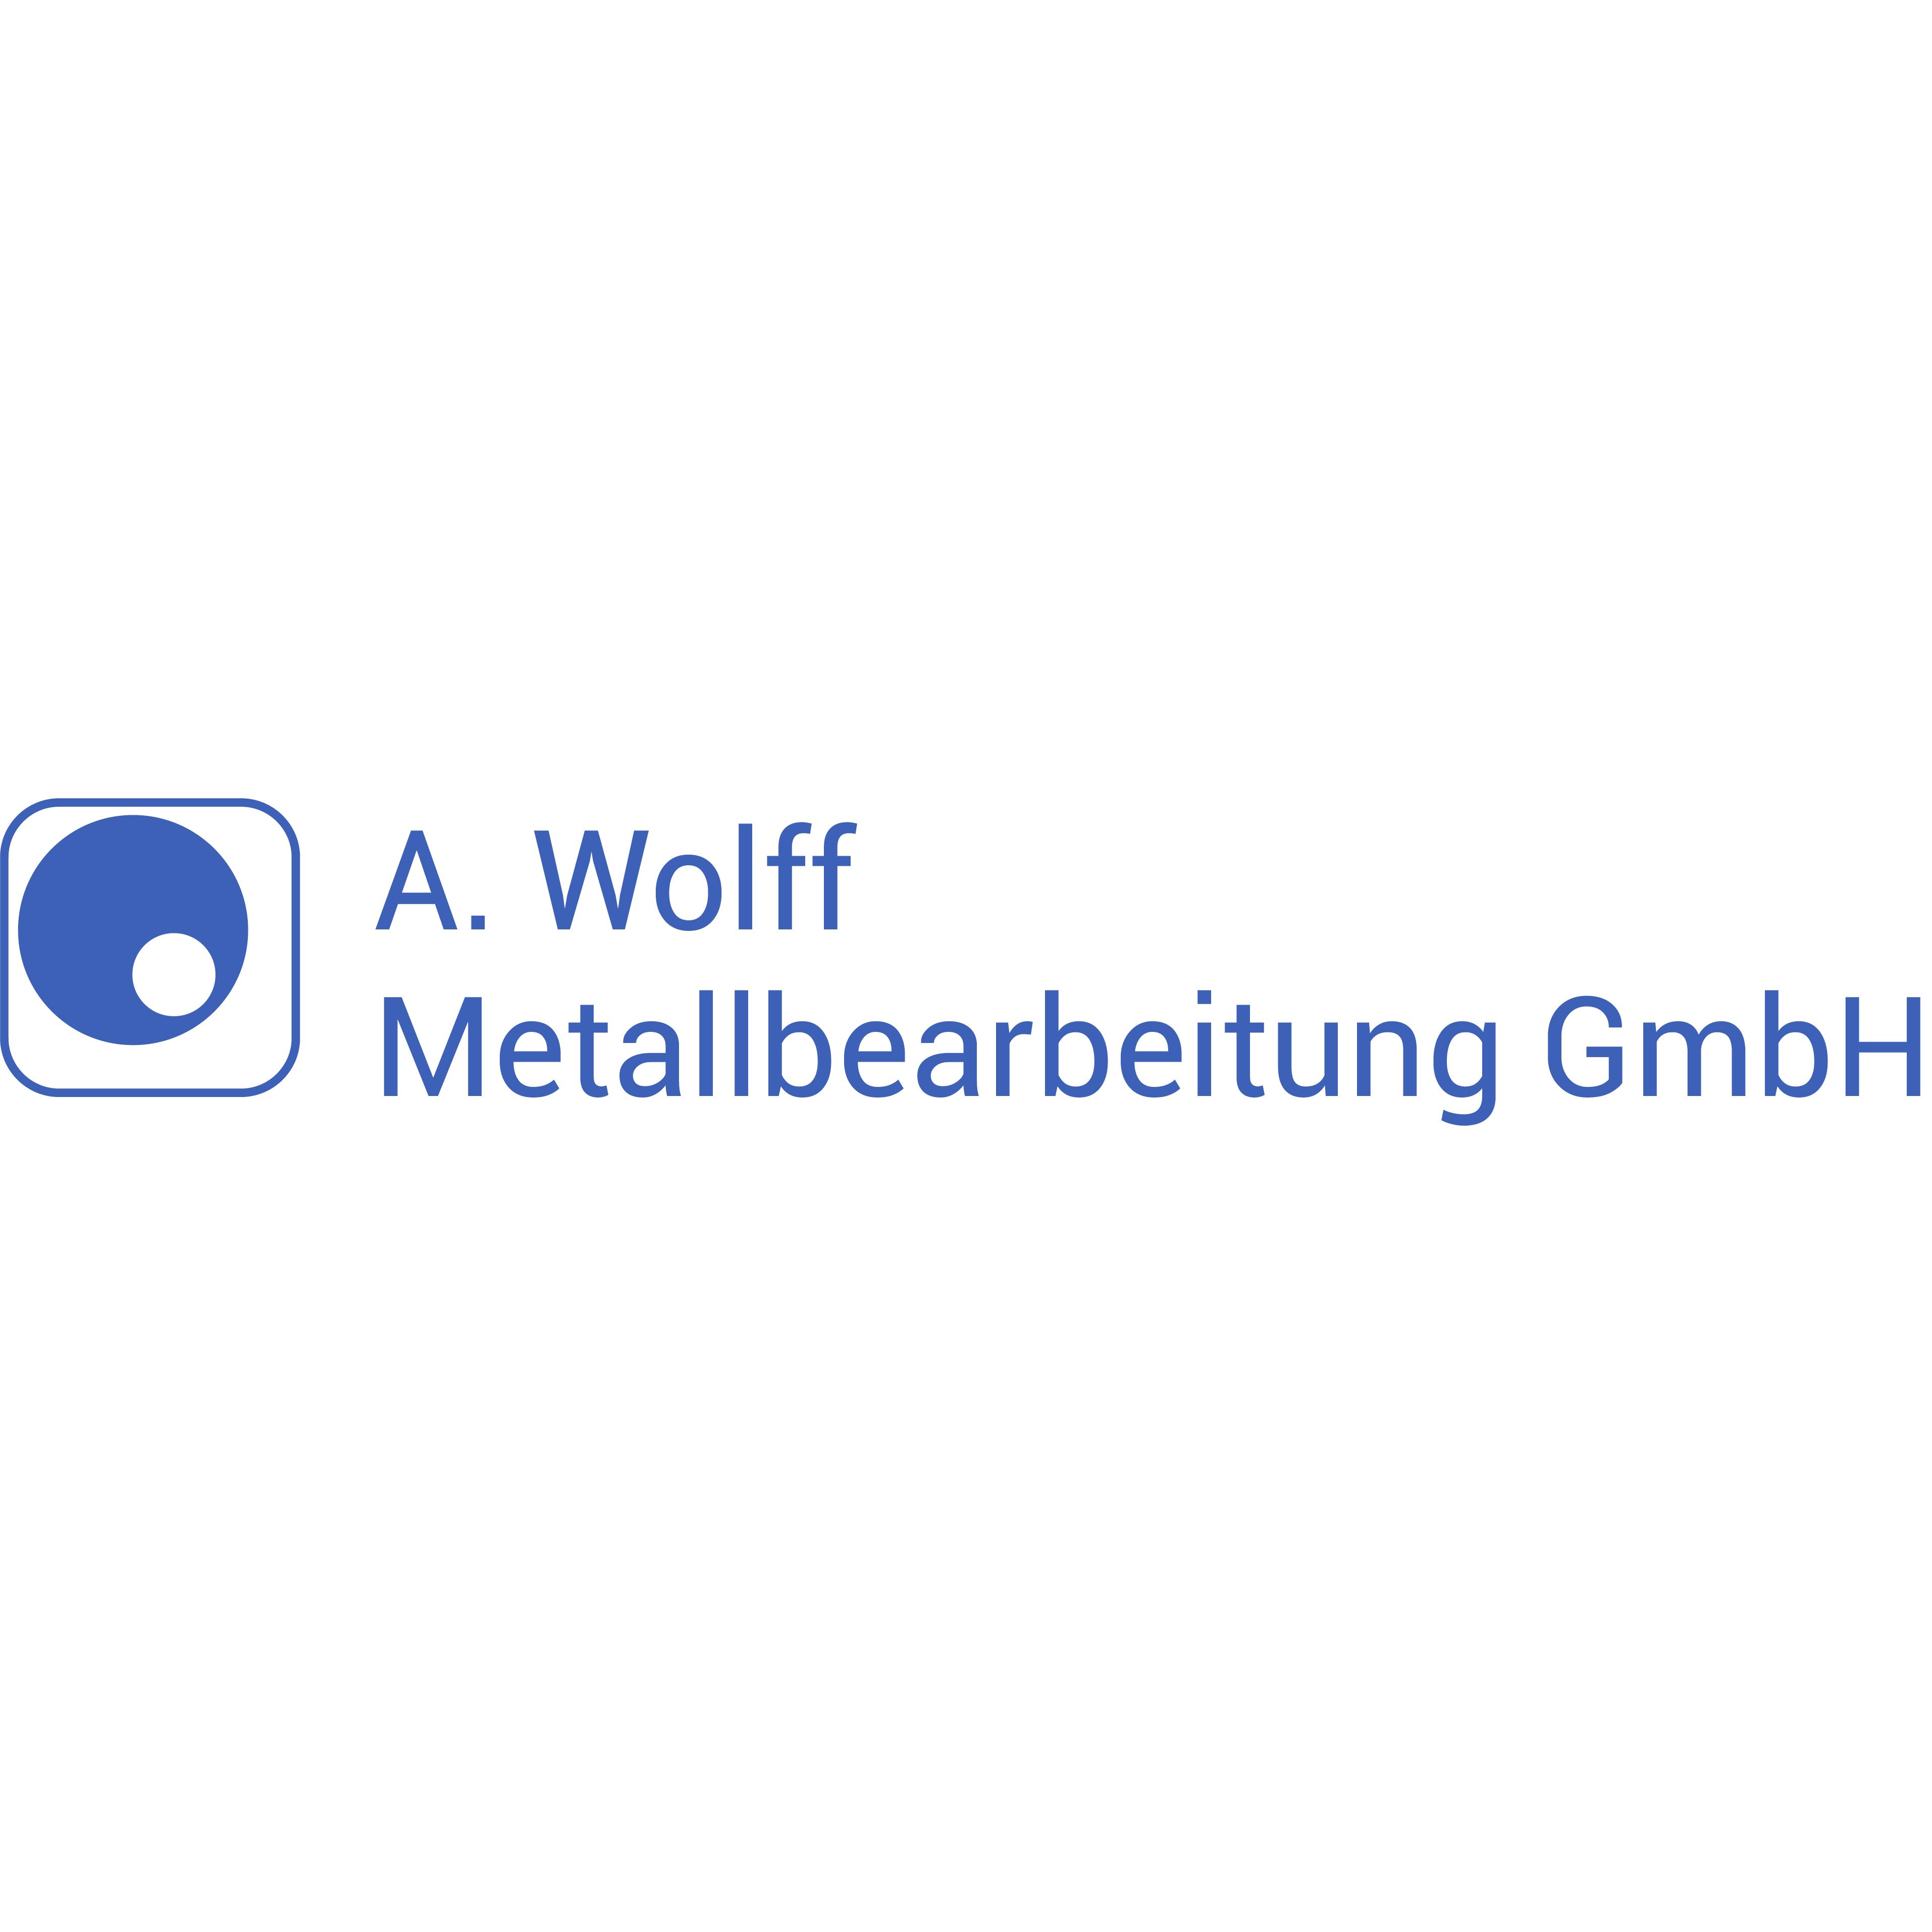 Bild zu Andreas Wolff Metallbearbeitung GmbH in Iserlohn